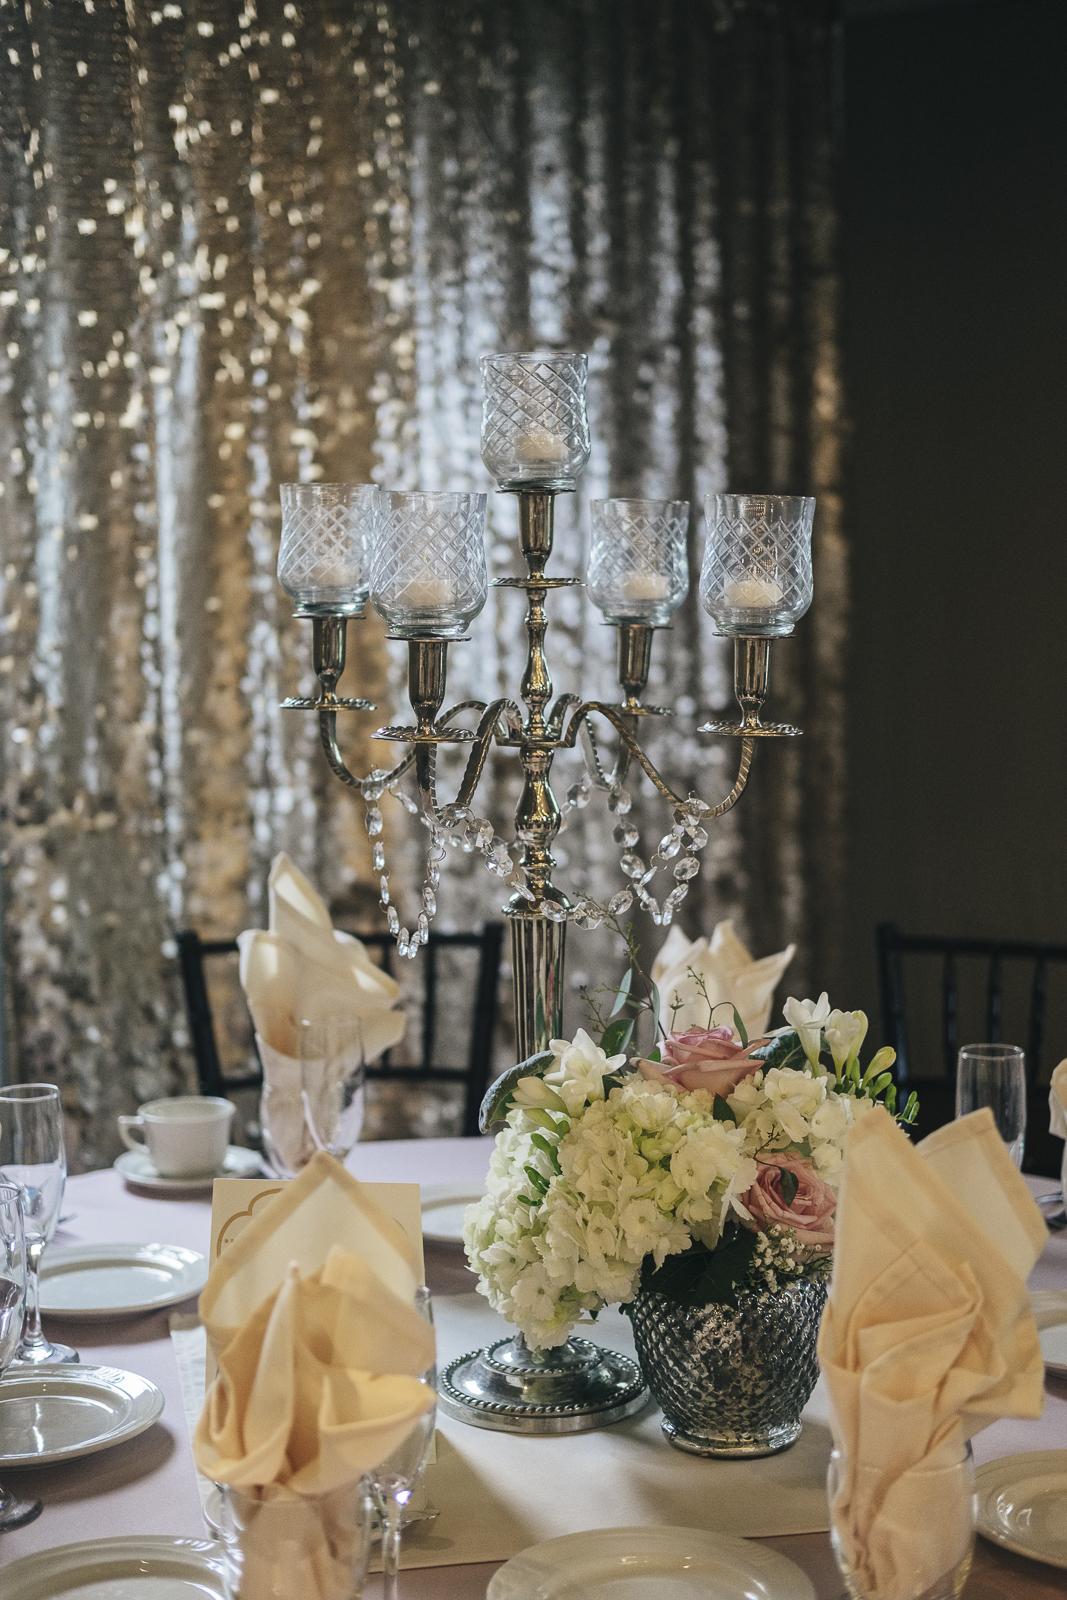 La Boutique Nostalgie wedding reception decor.